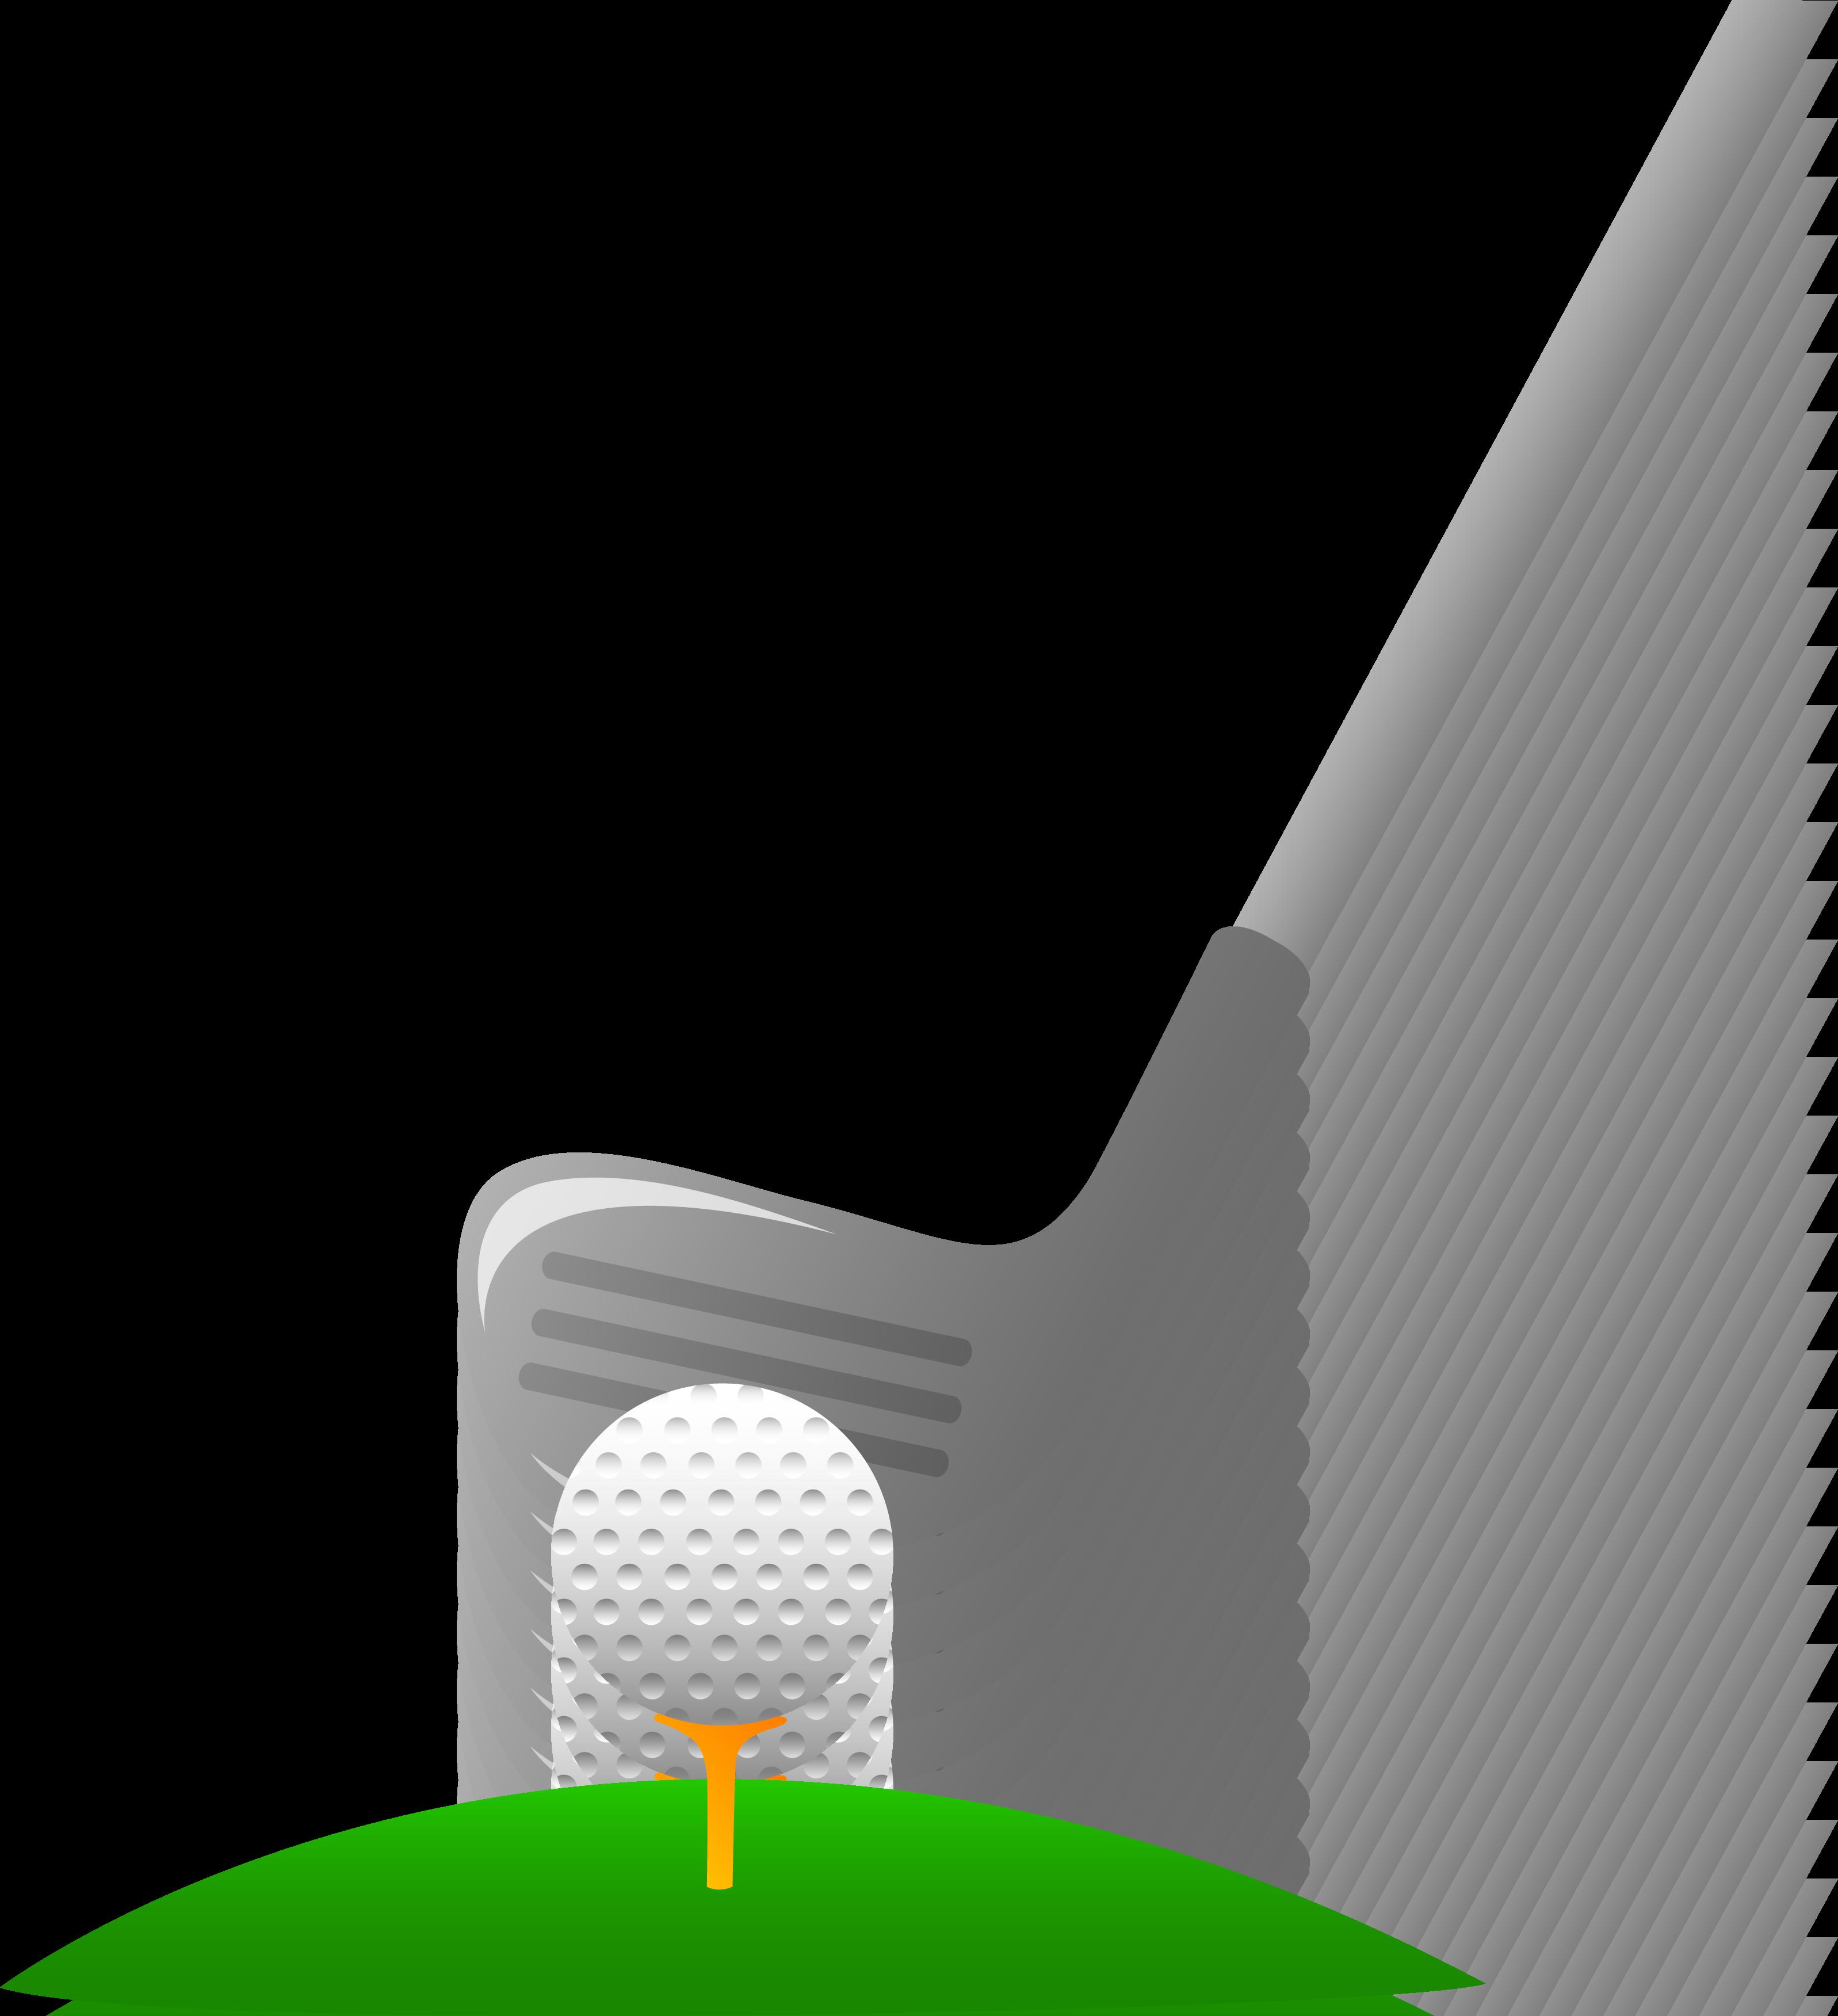 Download Golf Ball Png Hq Png Image Freepngimg